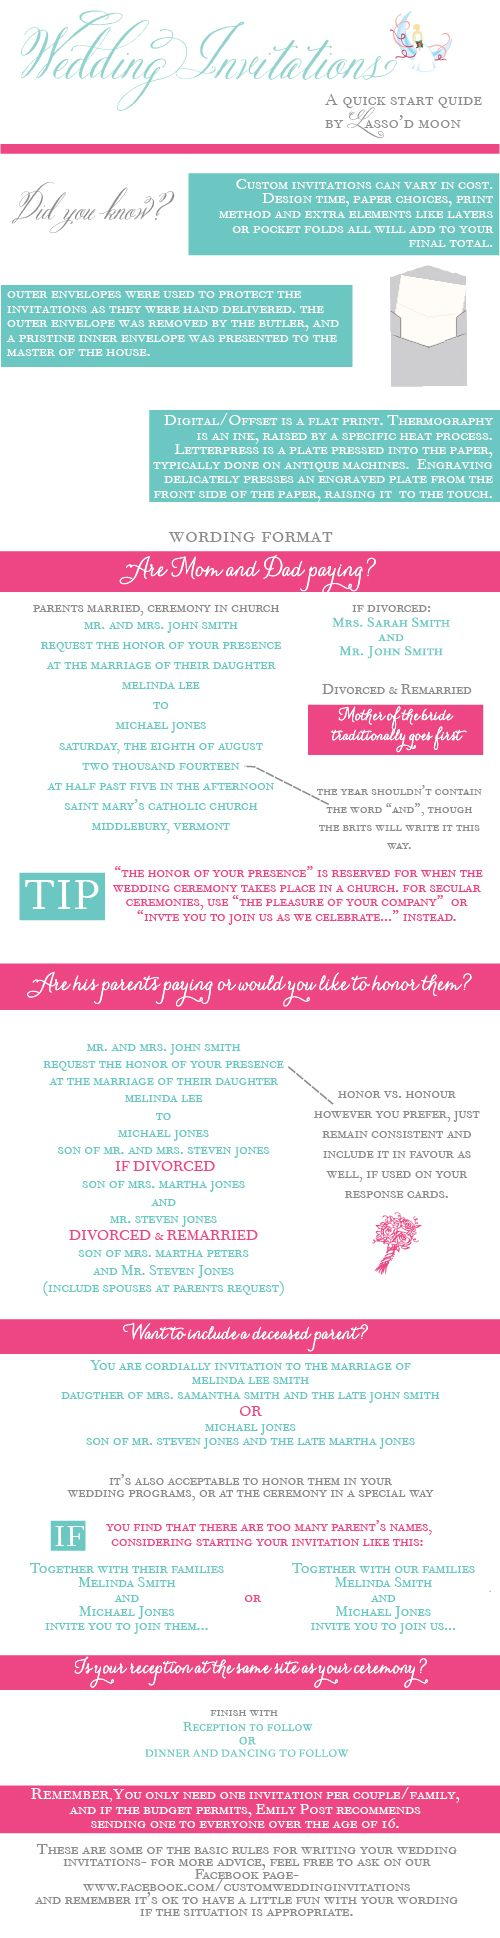 quick start guide to wedding invite wording